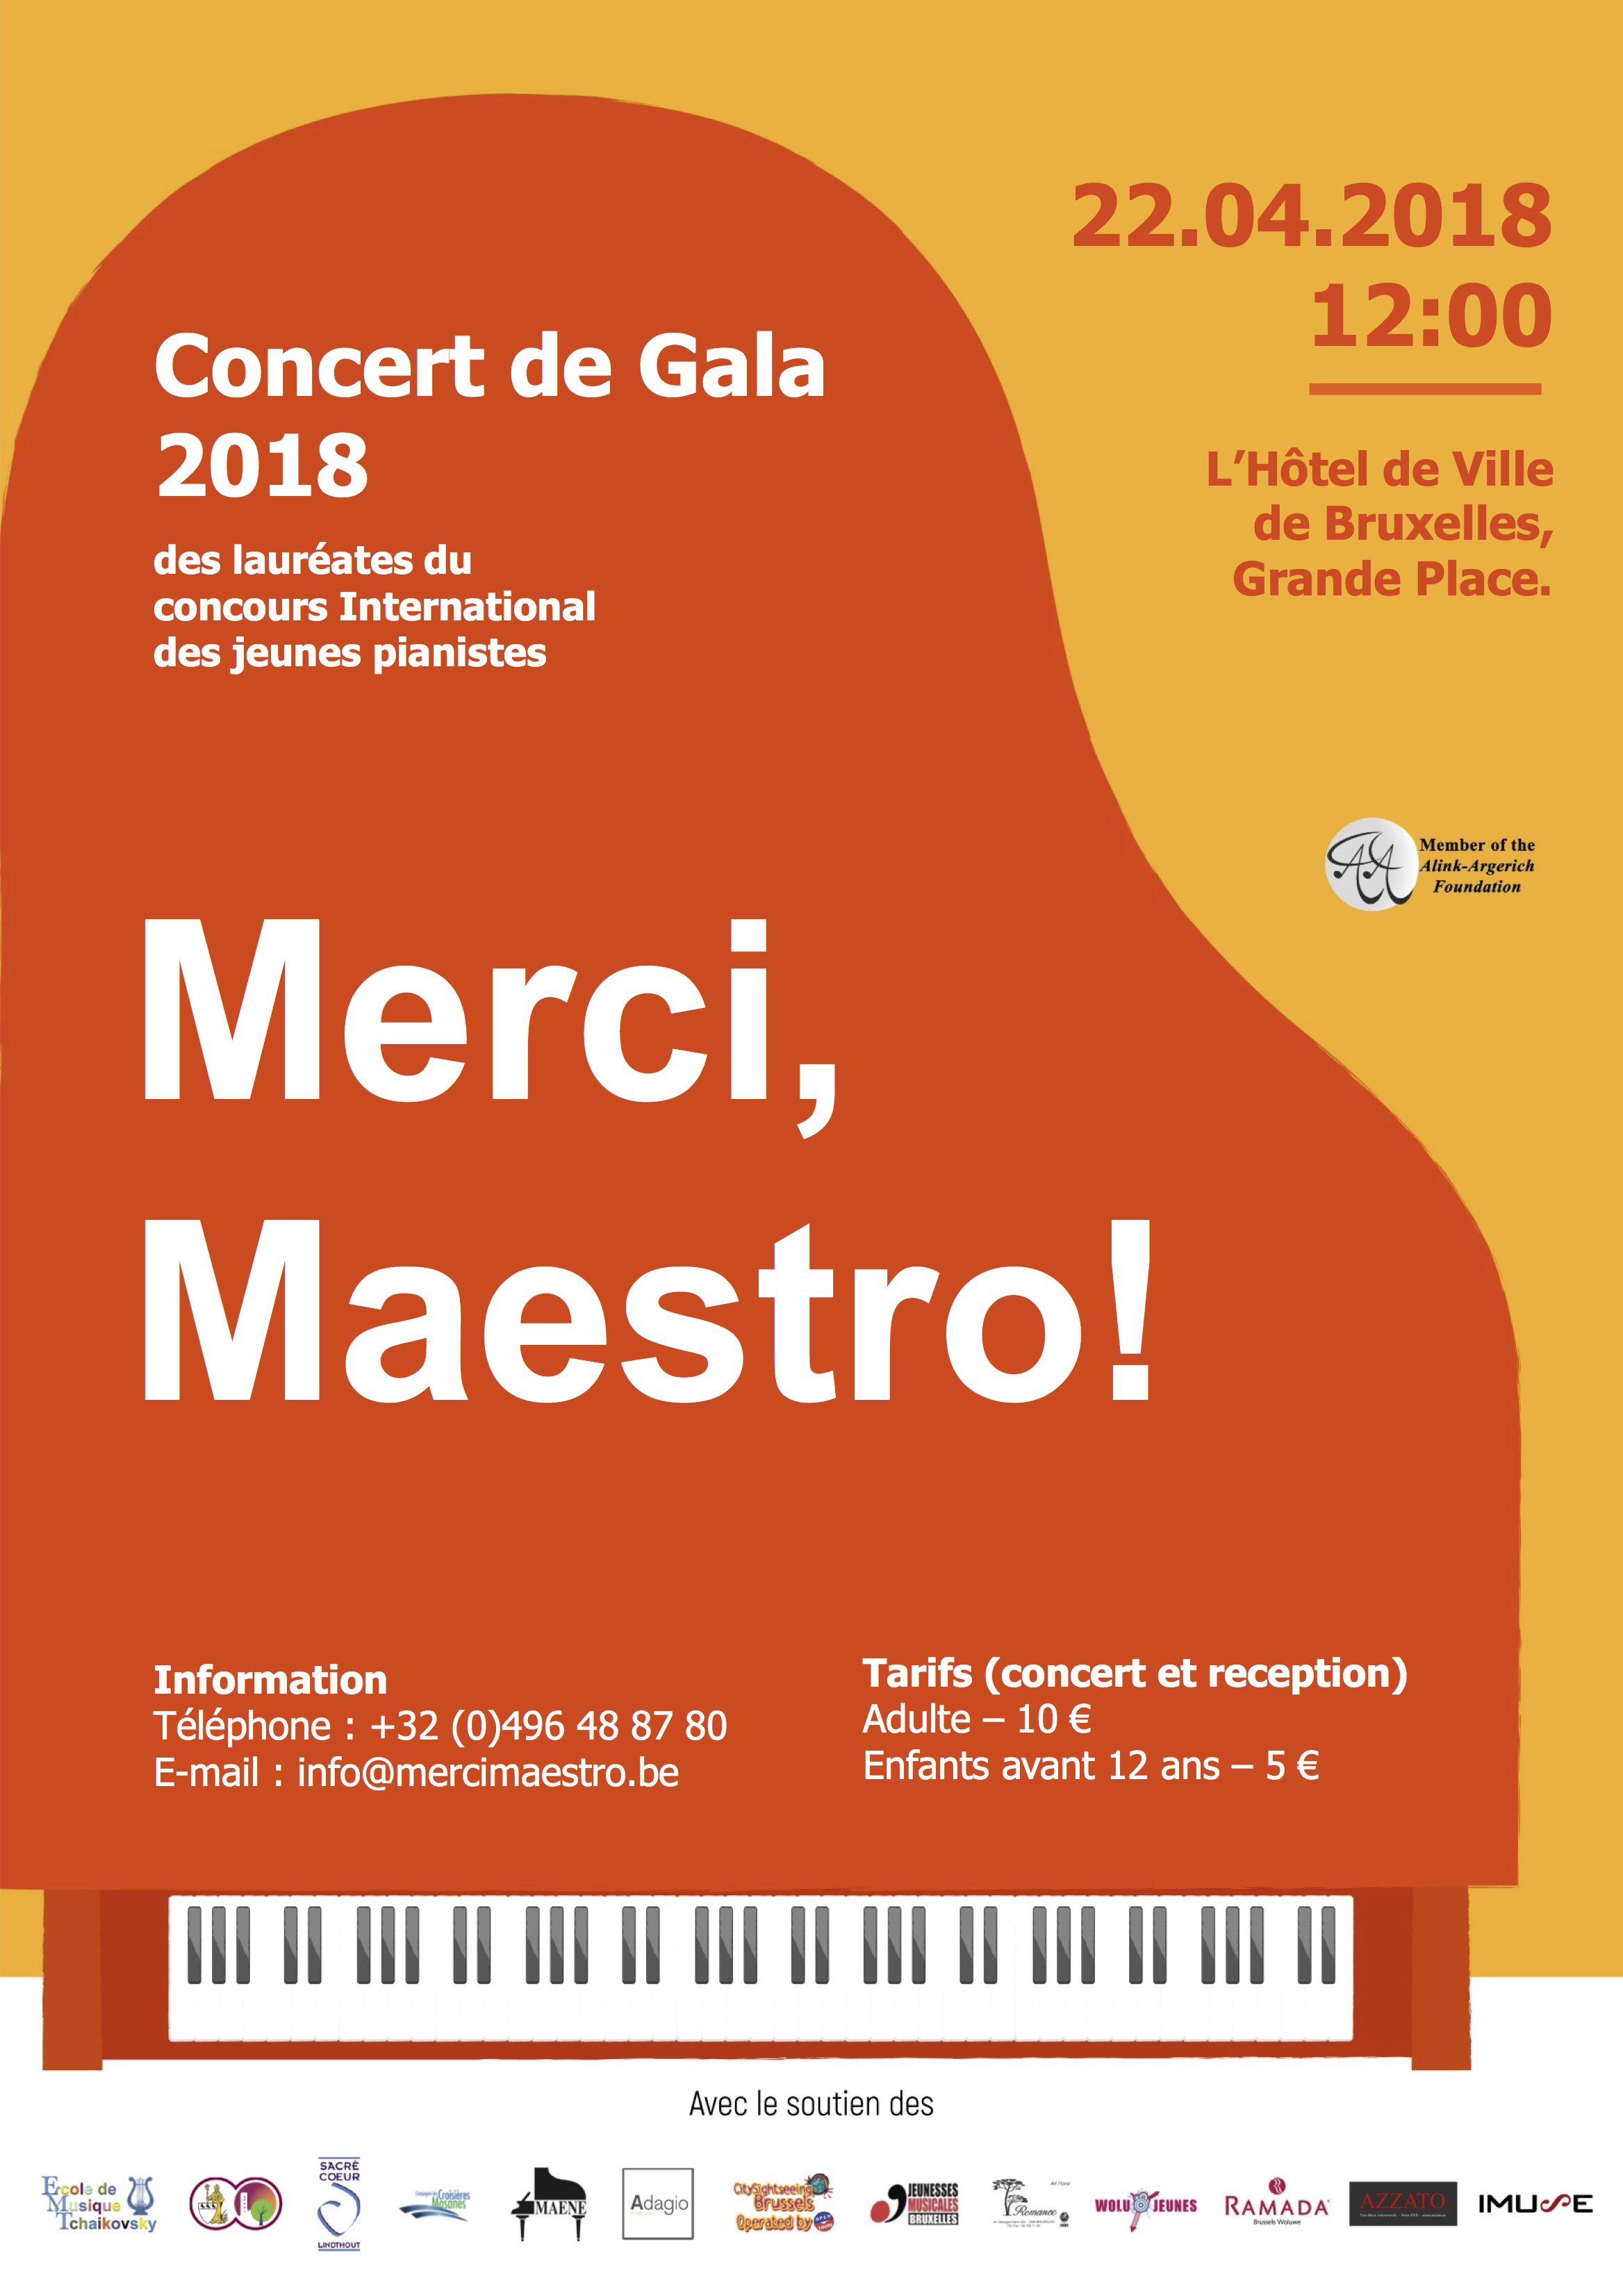 Concert de Gala 2018